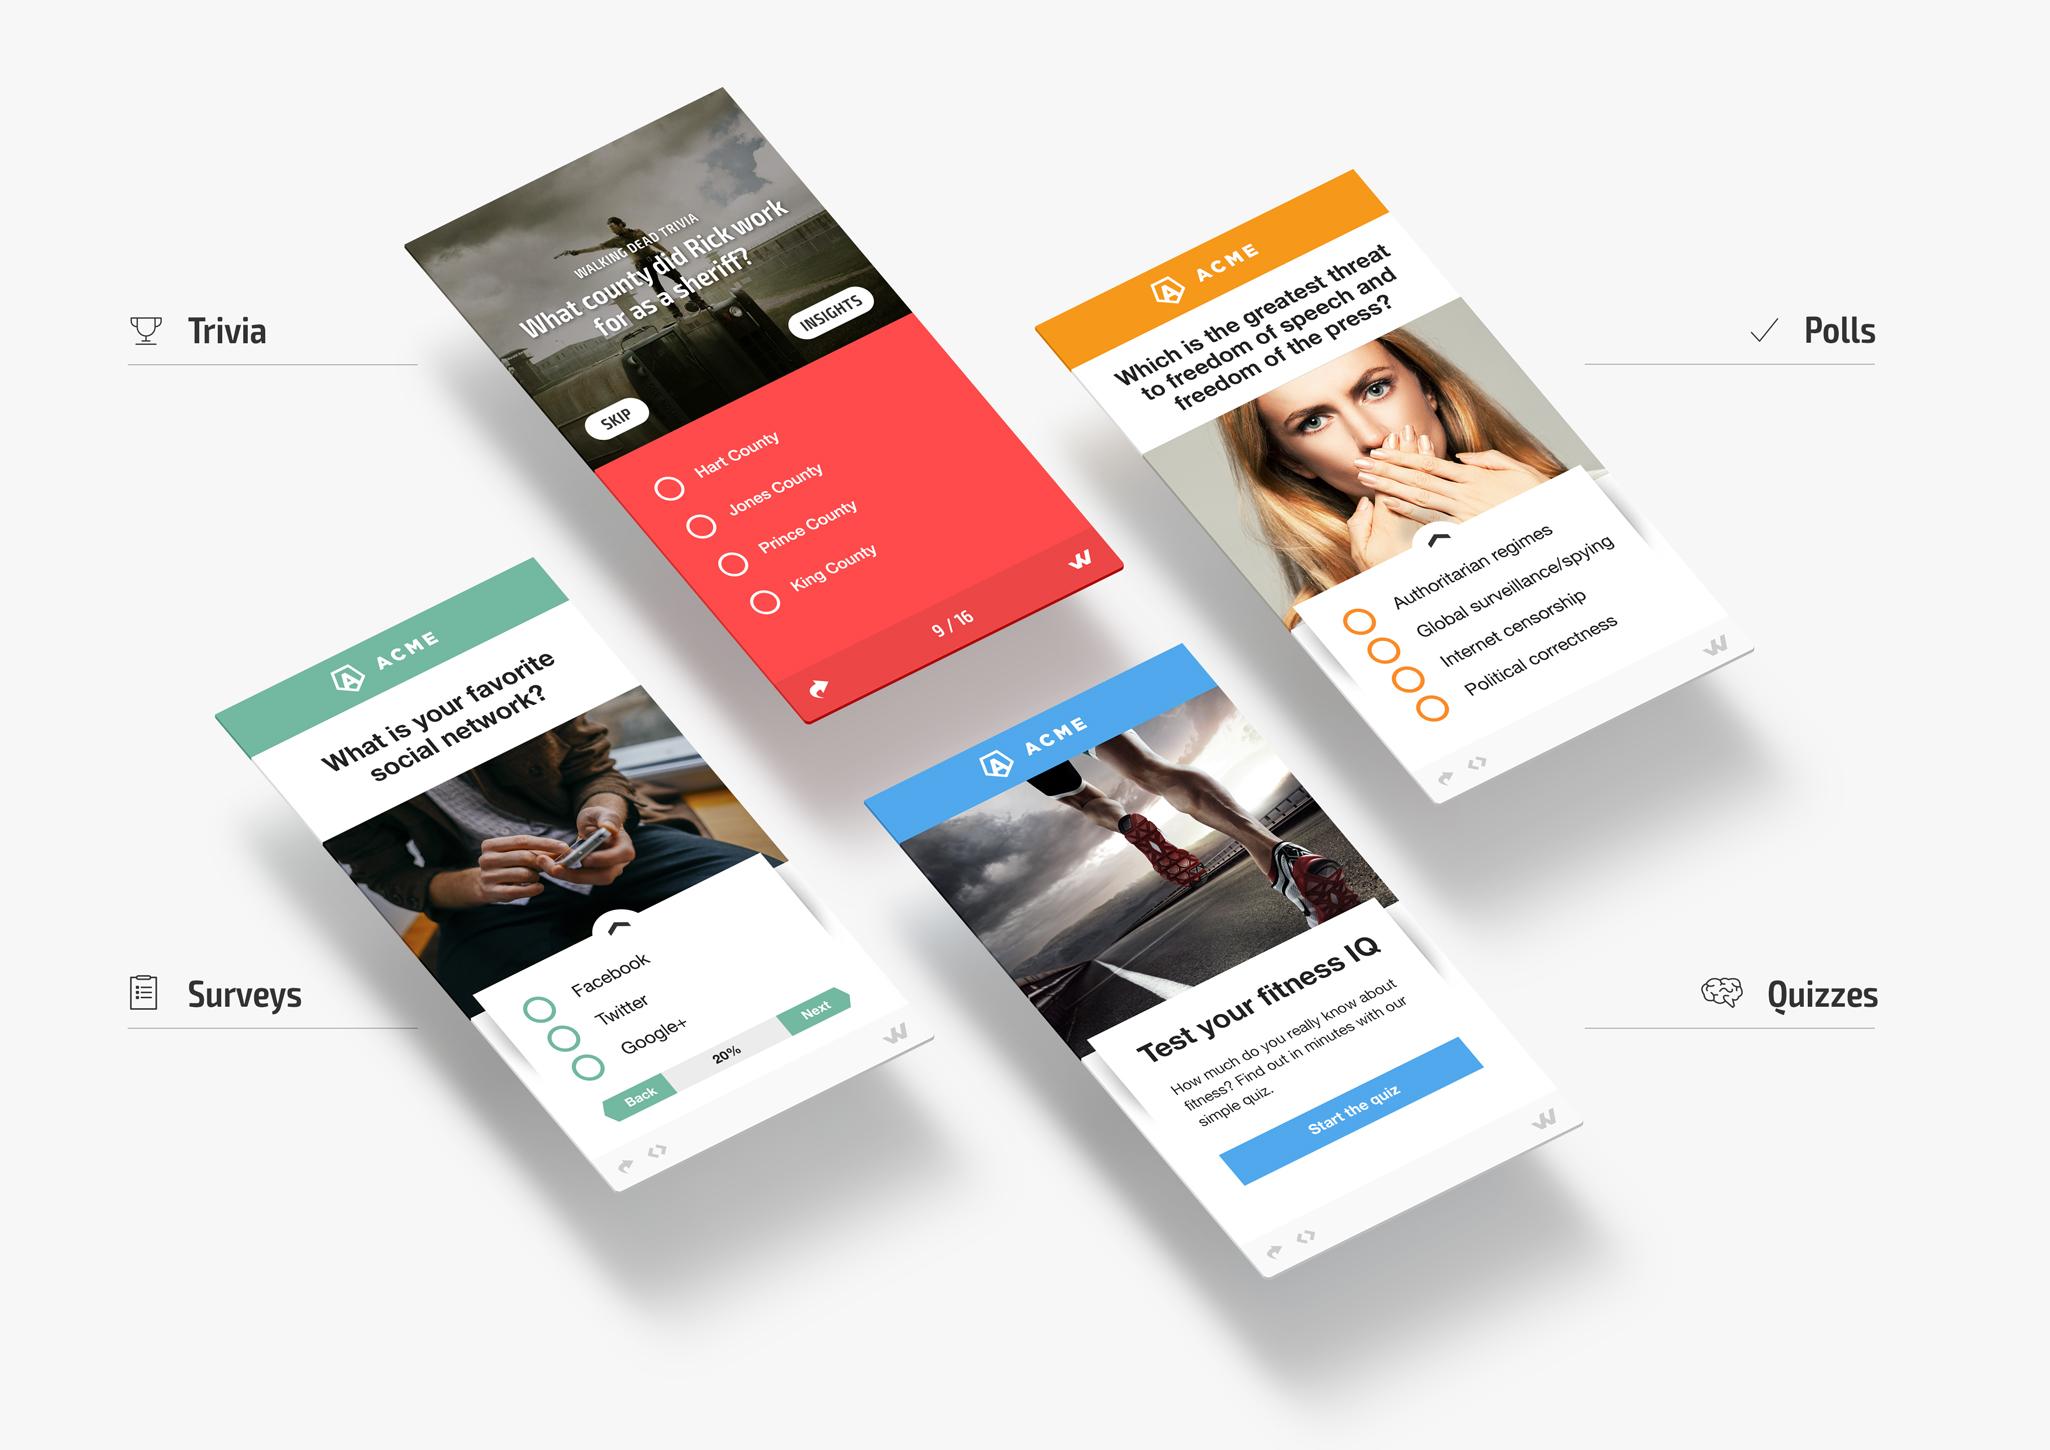 Perspective-screens-for-platform-apps.png